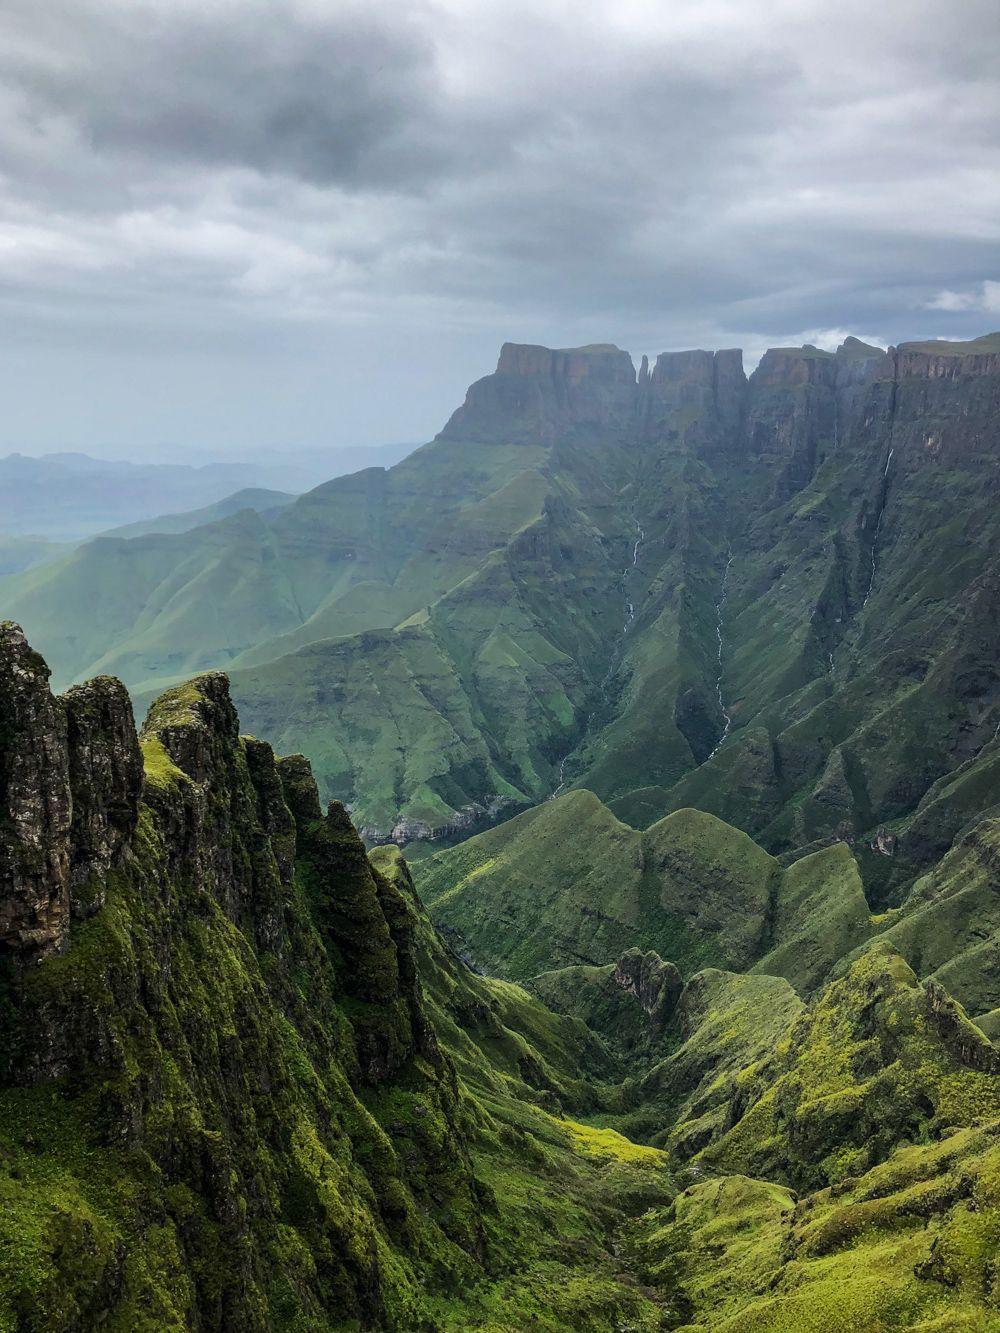 Hiking the Sentinel Peak Trail to Tugela Falls Visit